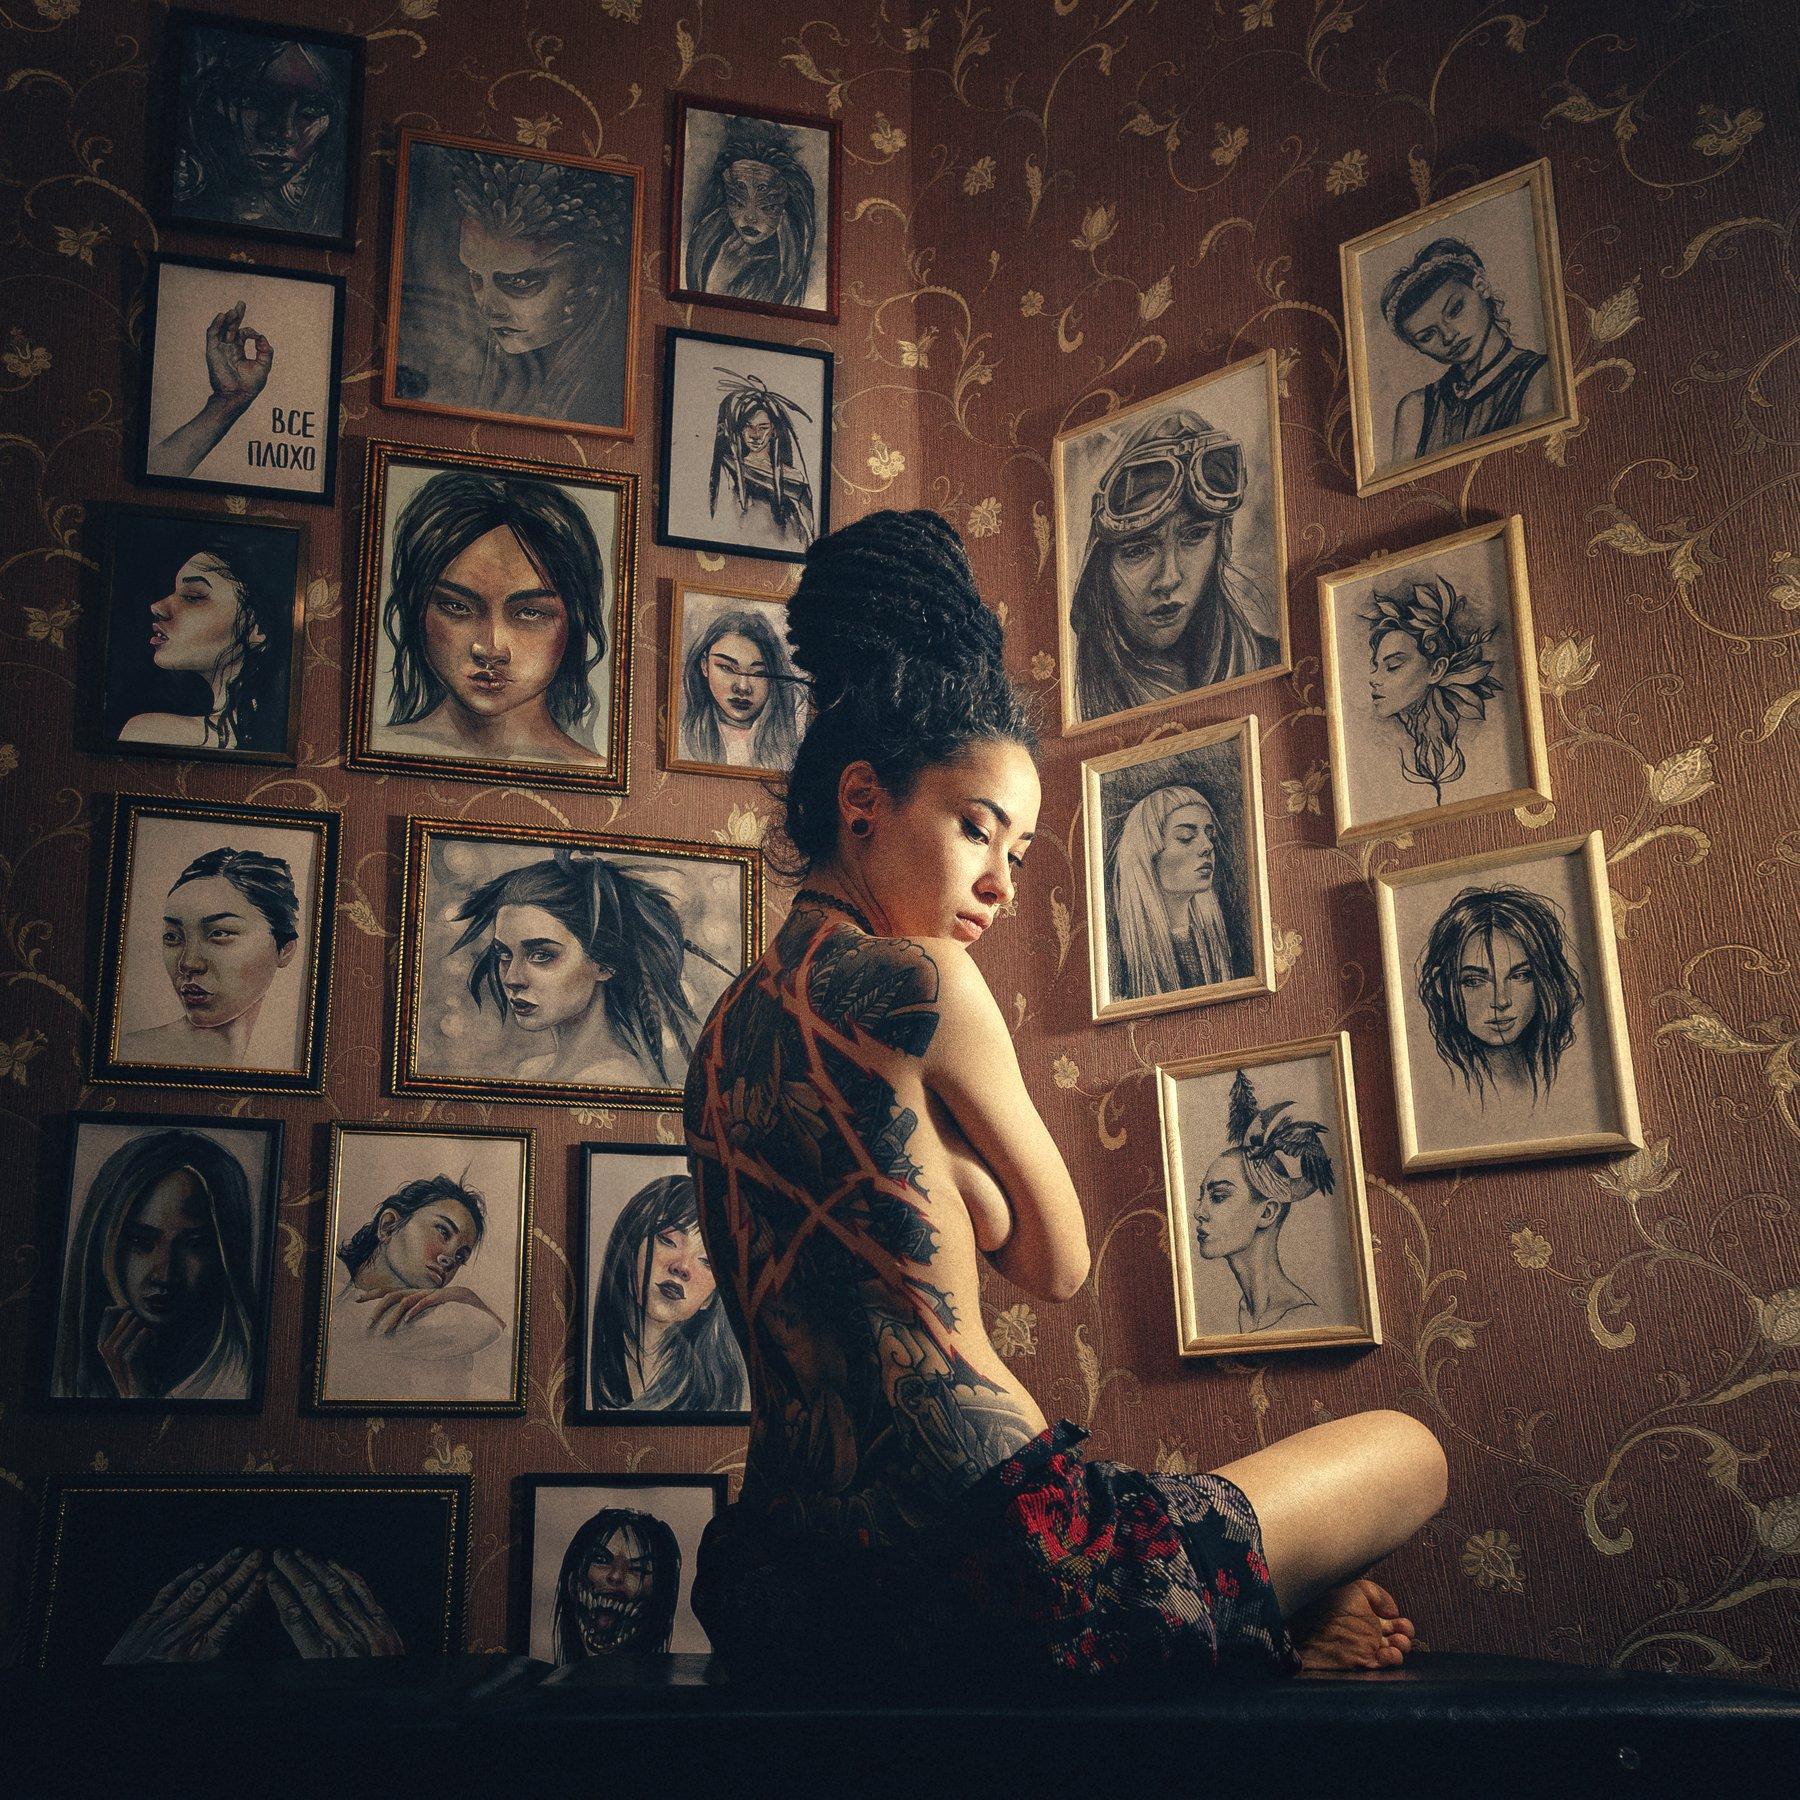 girl model tattoo artist nude drawing light darkness loneliness silence topless Russia dreadlocks девушка модель тату художник ню рисунок свет темнота одиночество тишина топлес Россия дреды, Васильев Андрей